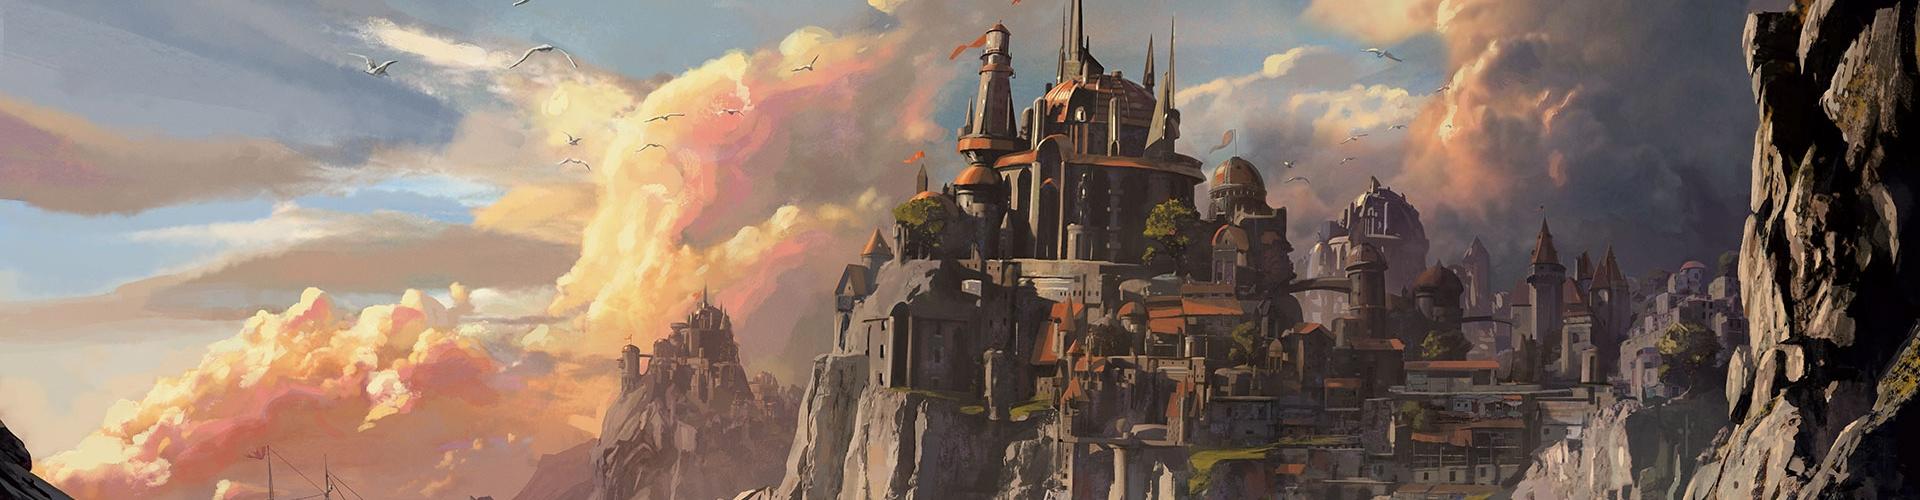 D&D's Statement Regarding Zak Smith   Dungeons & Dragons